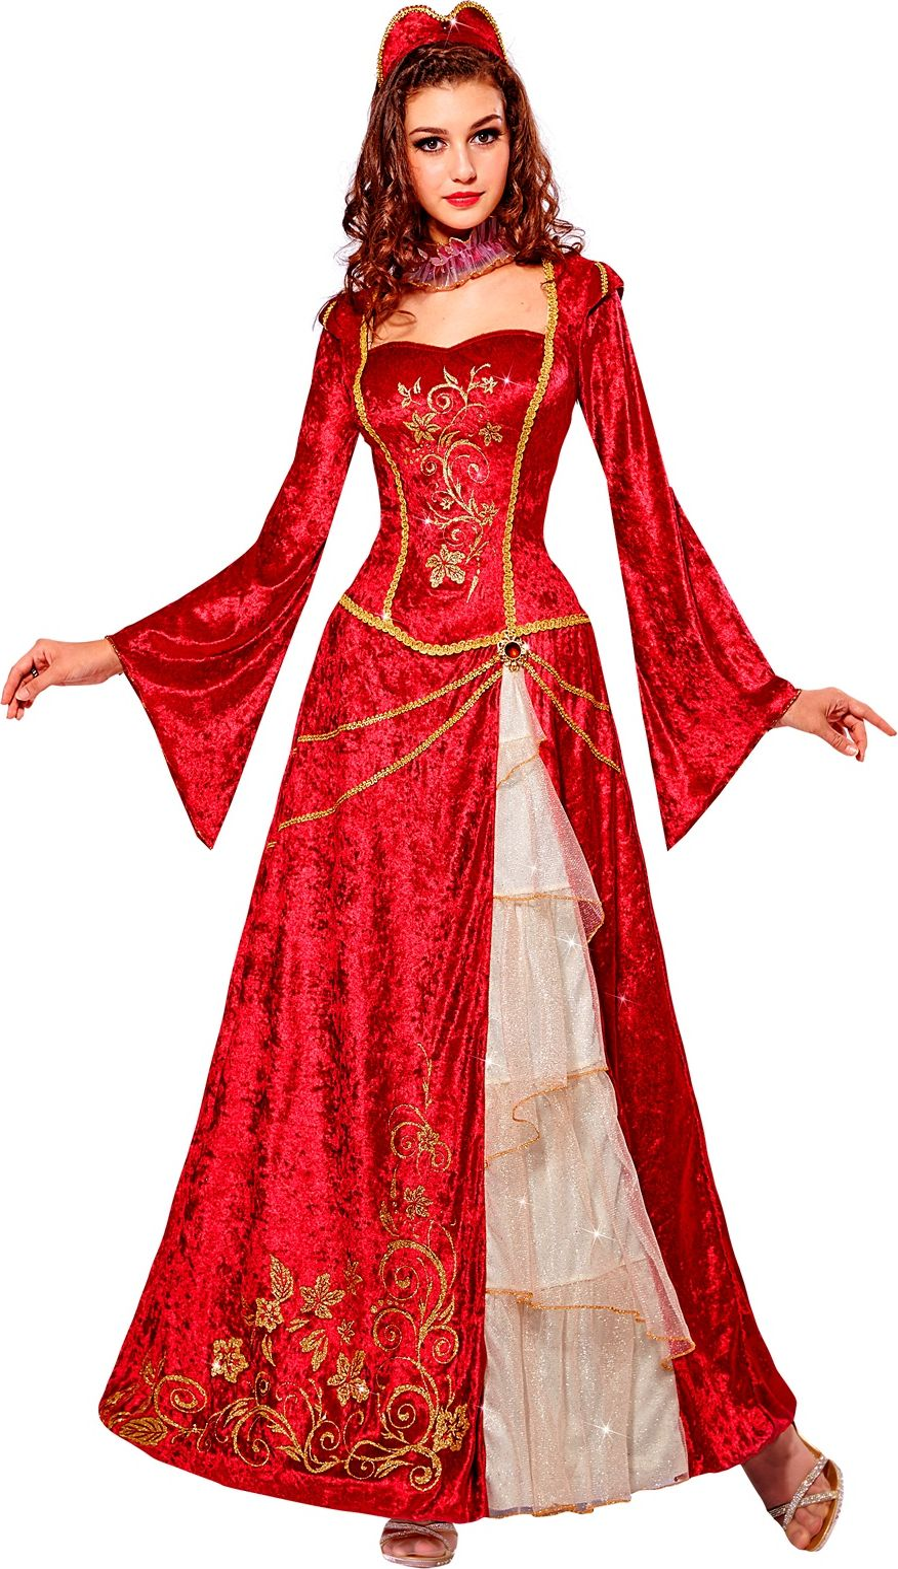 Renaissance prinses kostuum